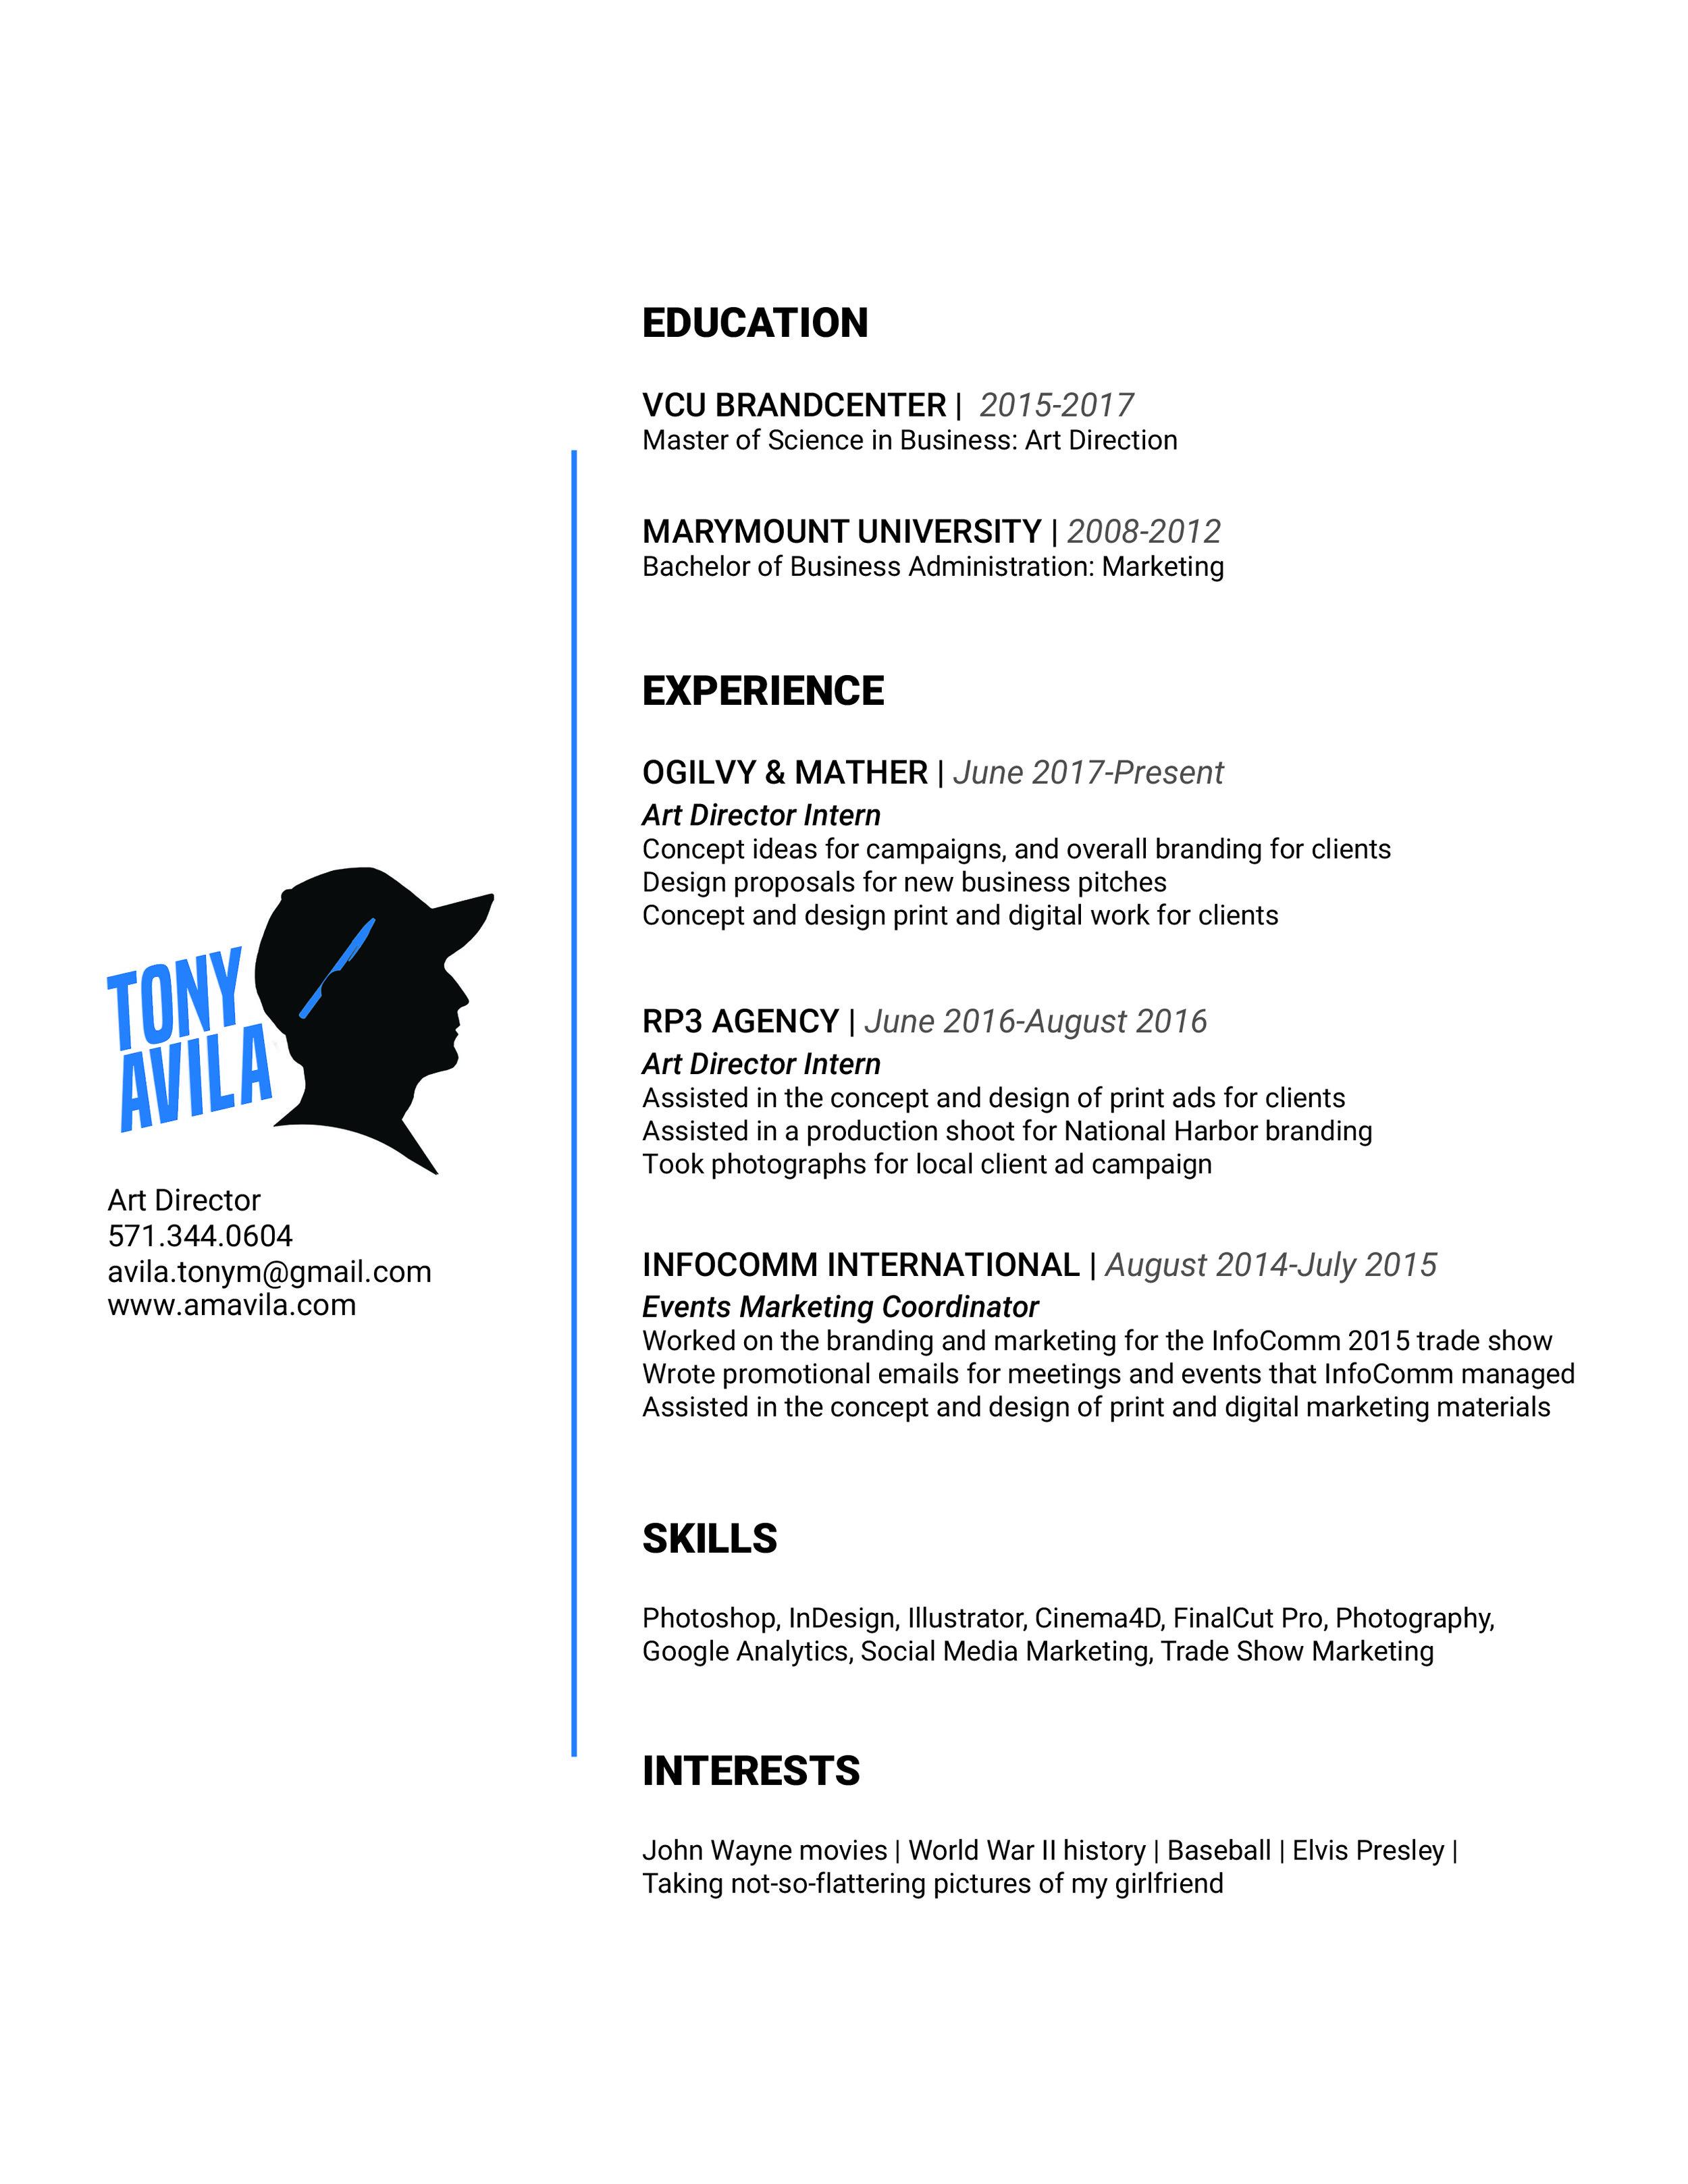 Resume2017_Avila_Tony.jpg